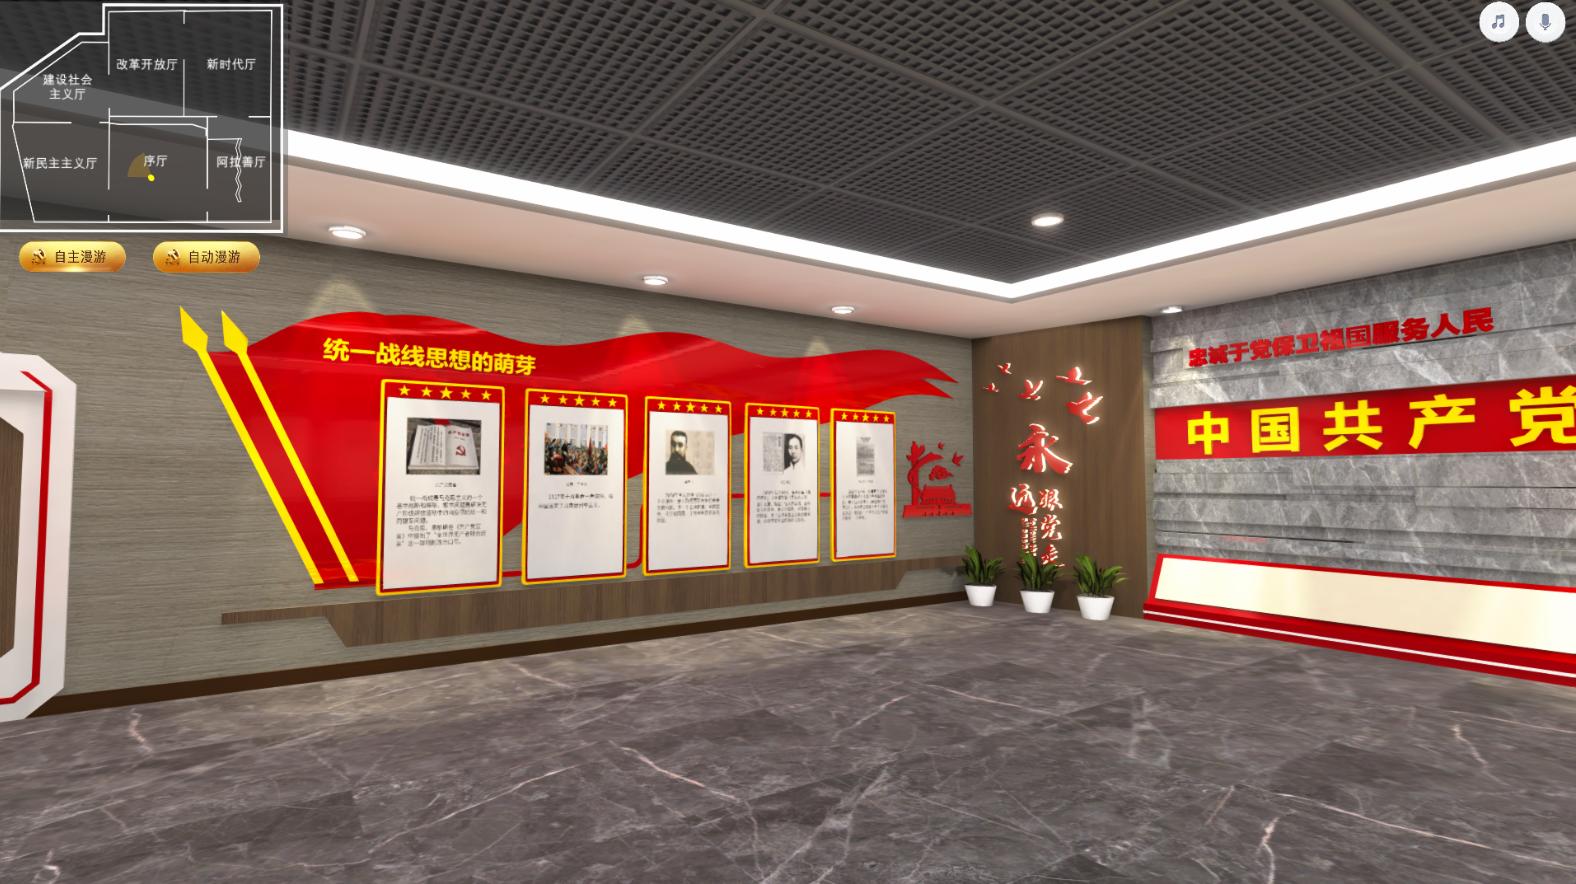 vr营销全景,北京四度科技web虚拟展馆的技术特点